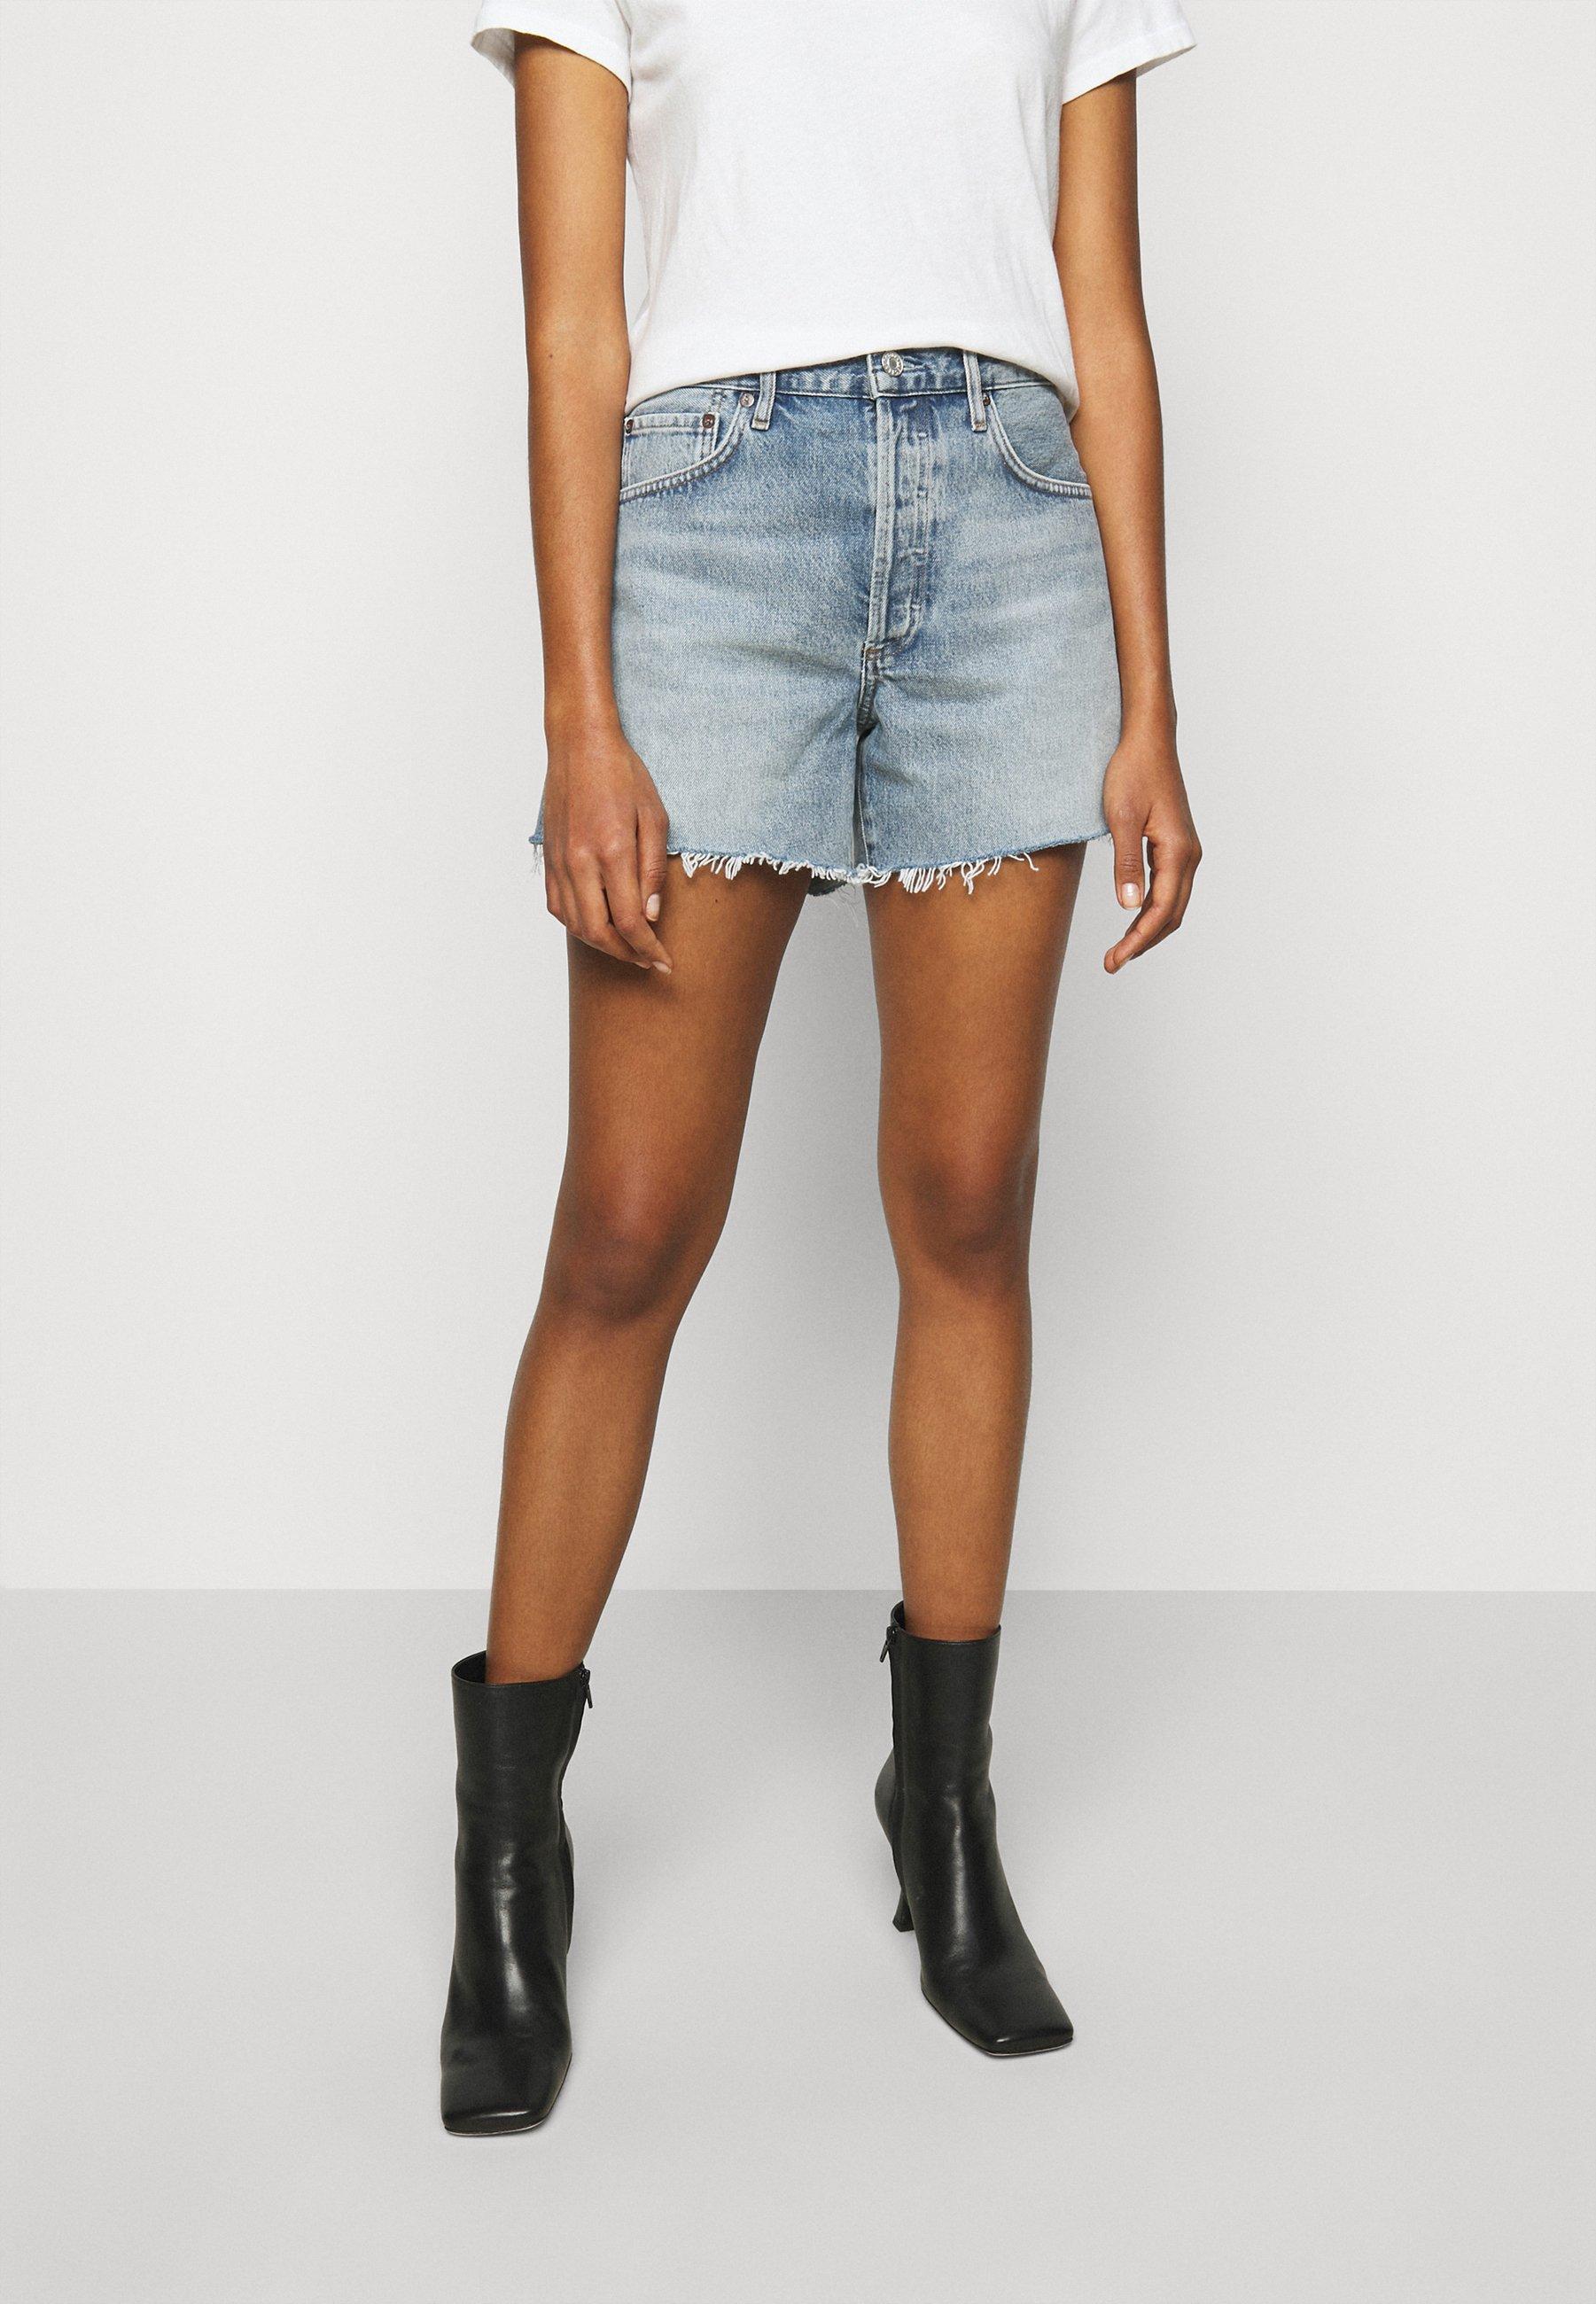 Damer REESE - Jeans Short / cowboy shorts